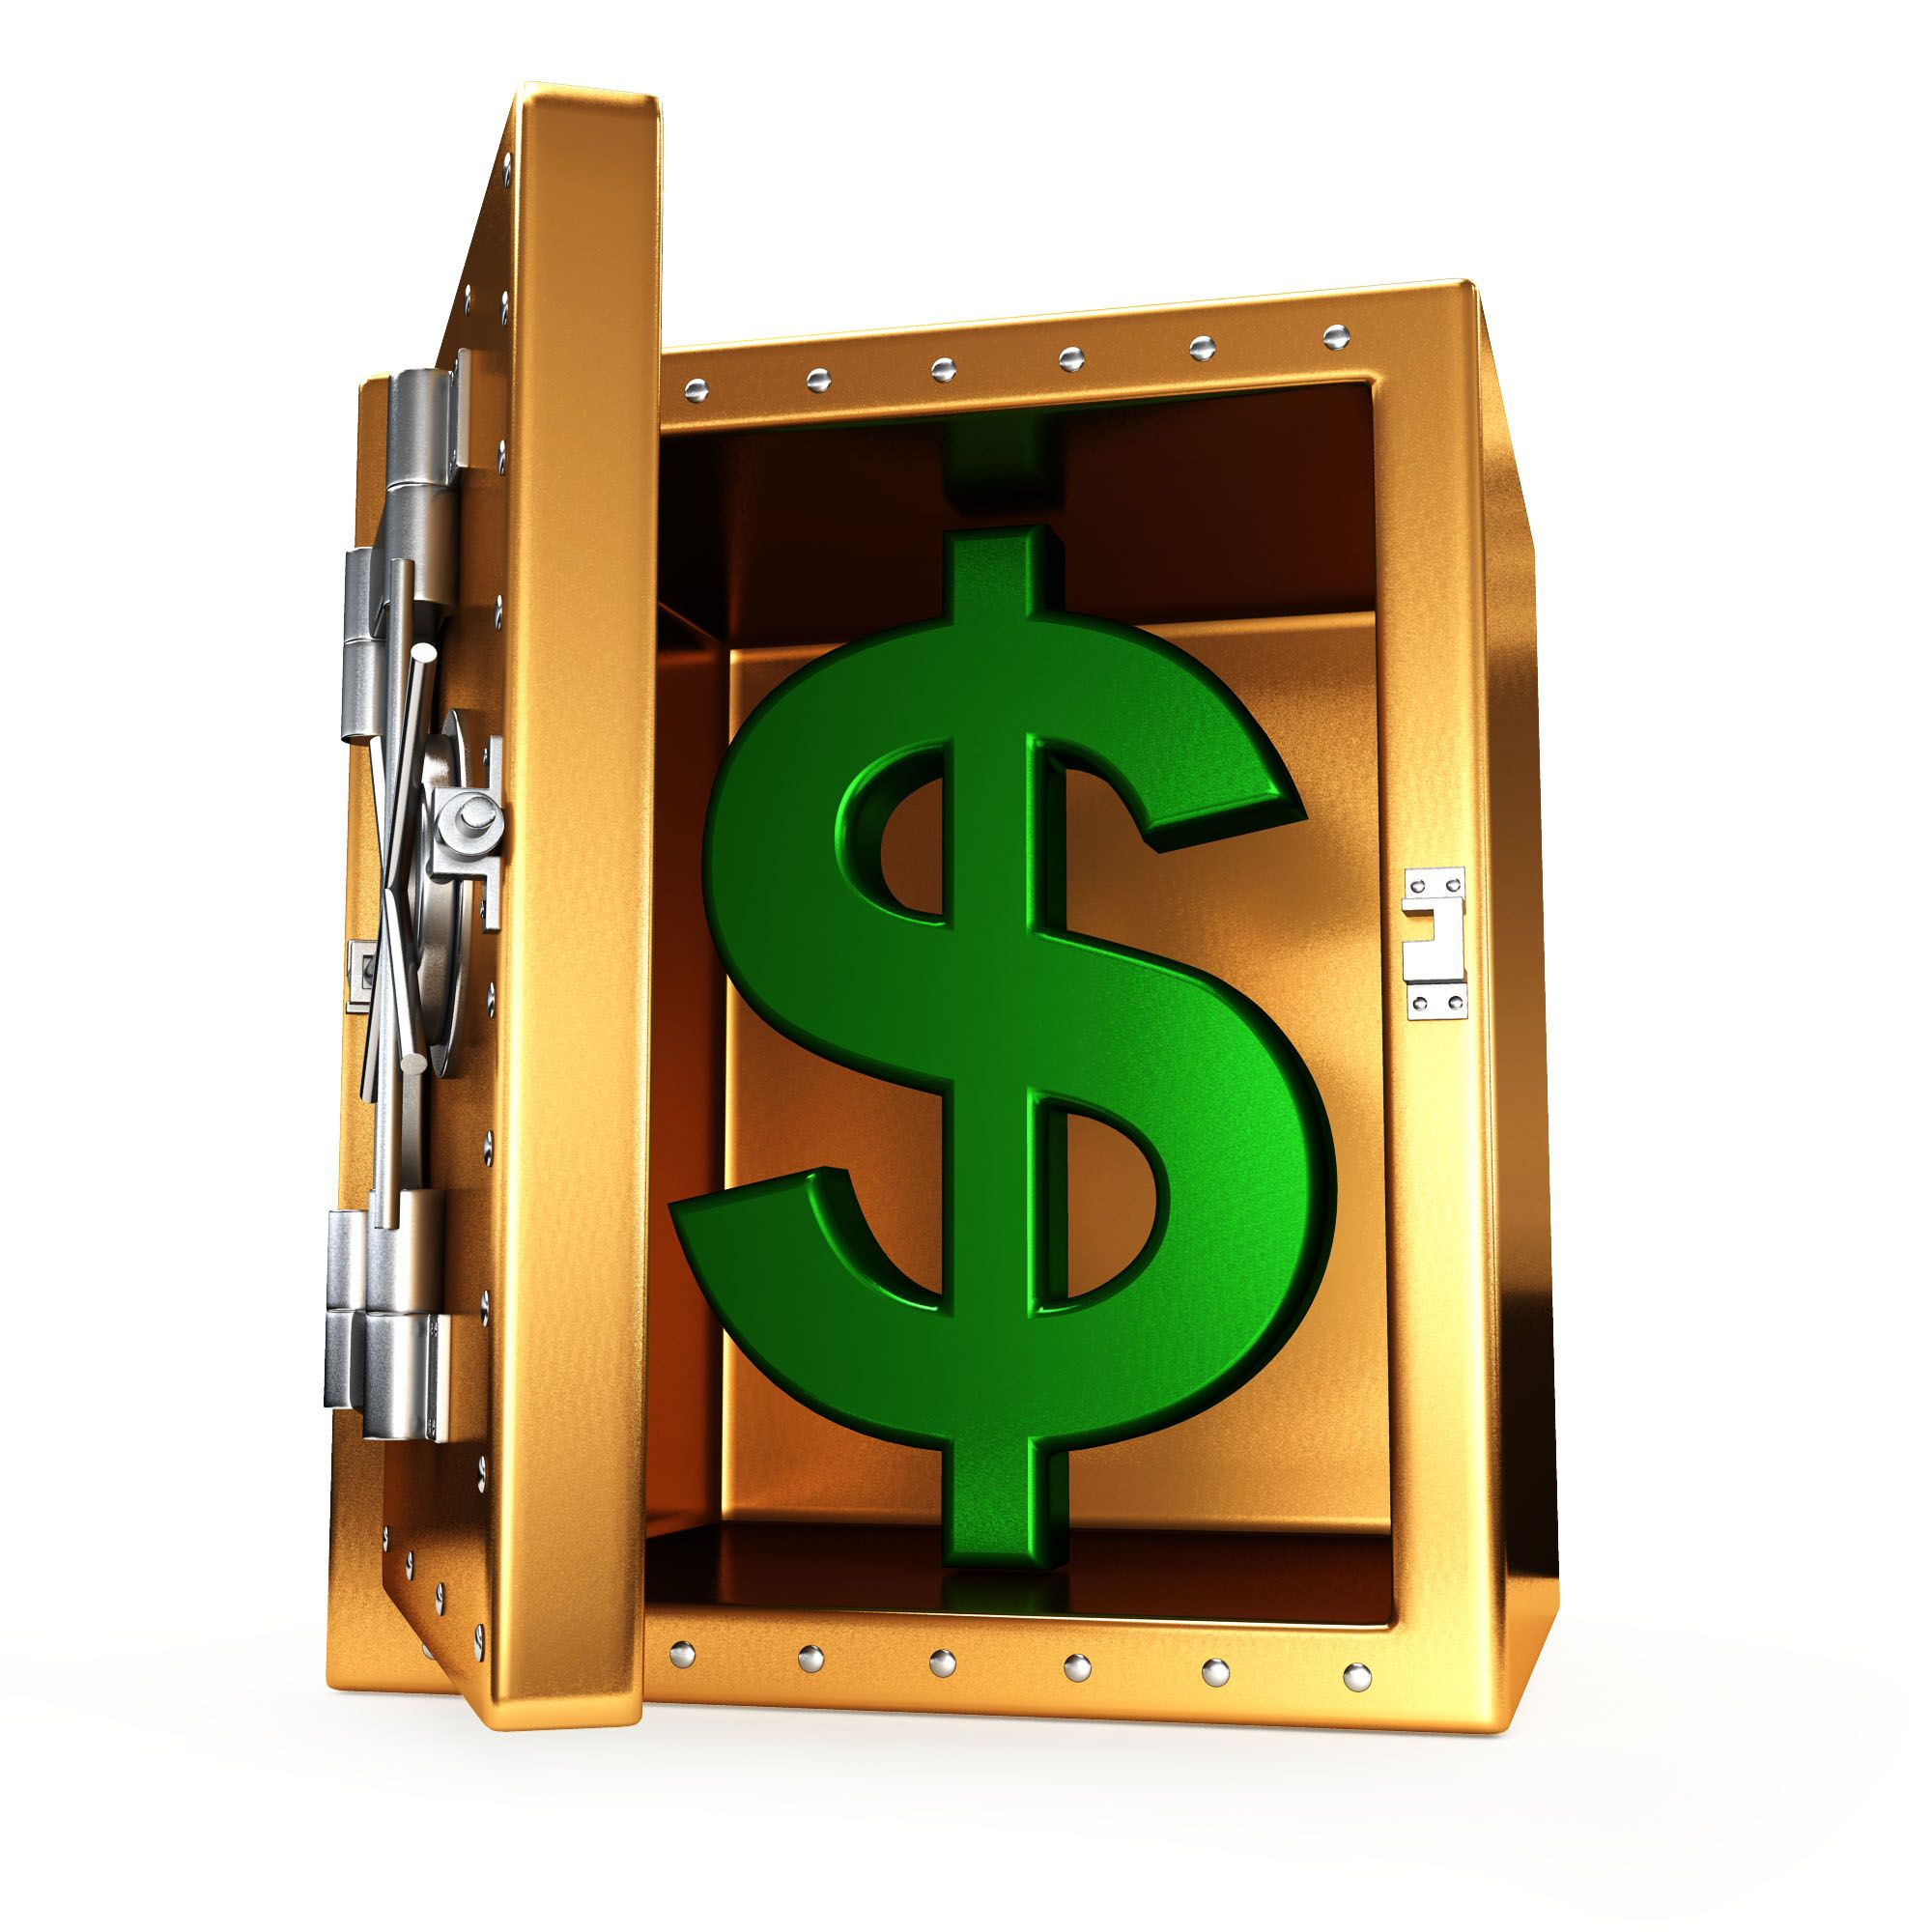 0914_3d_green_dollar_symbol_inside_the_safe_stock_photo_Slide01